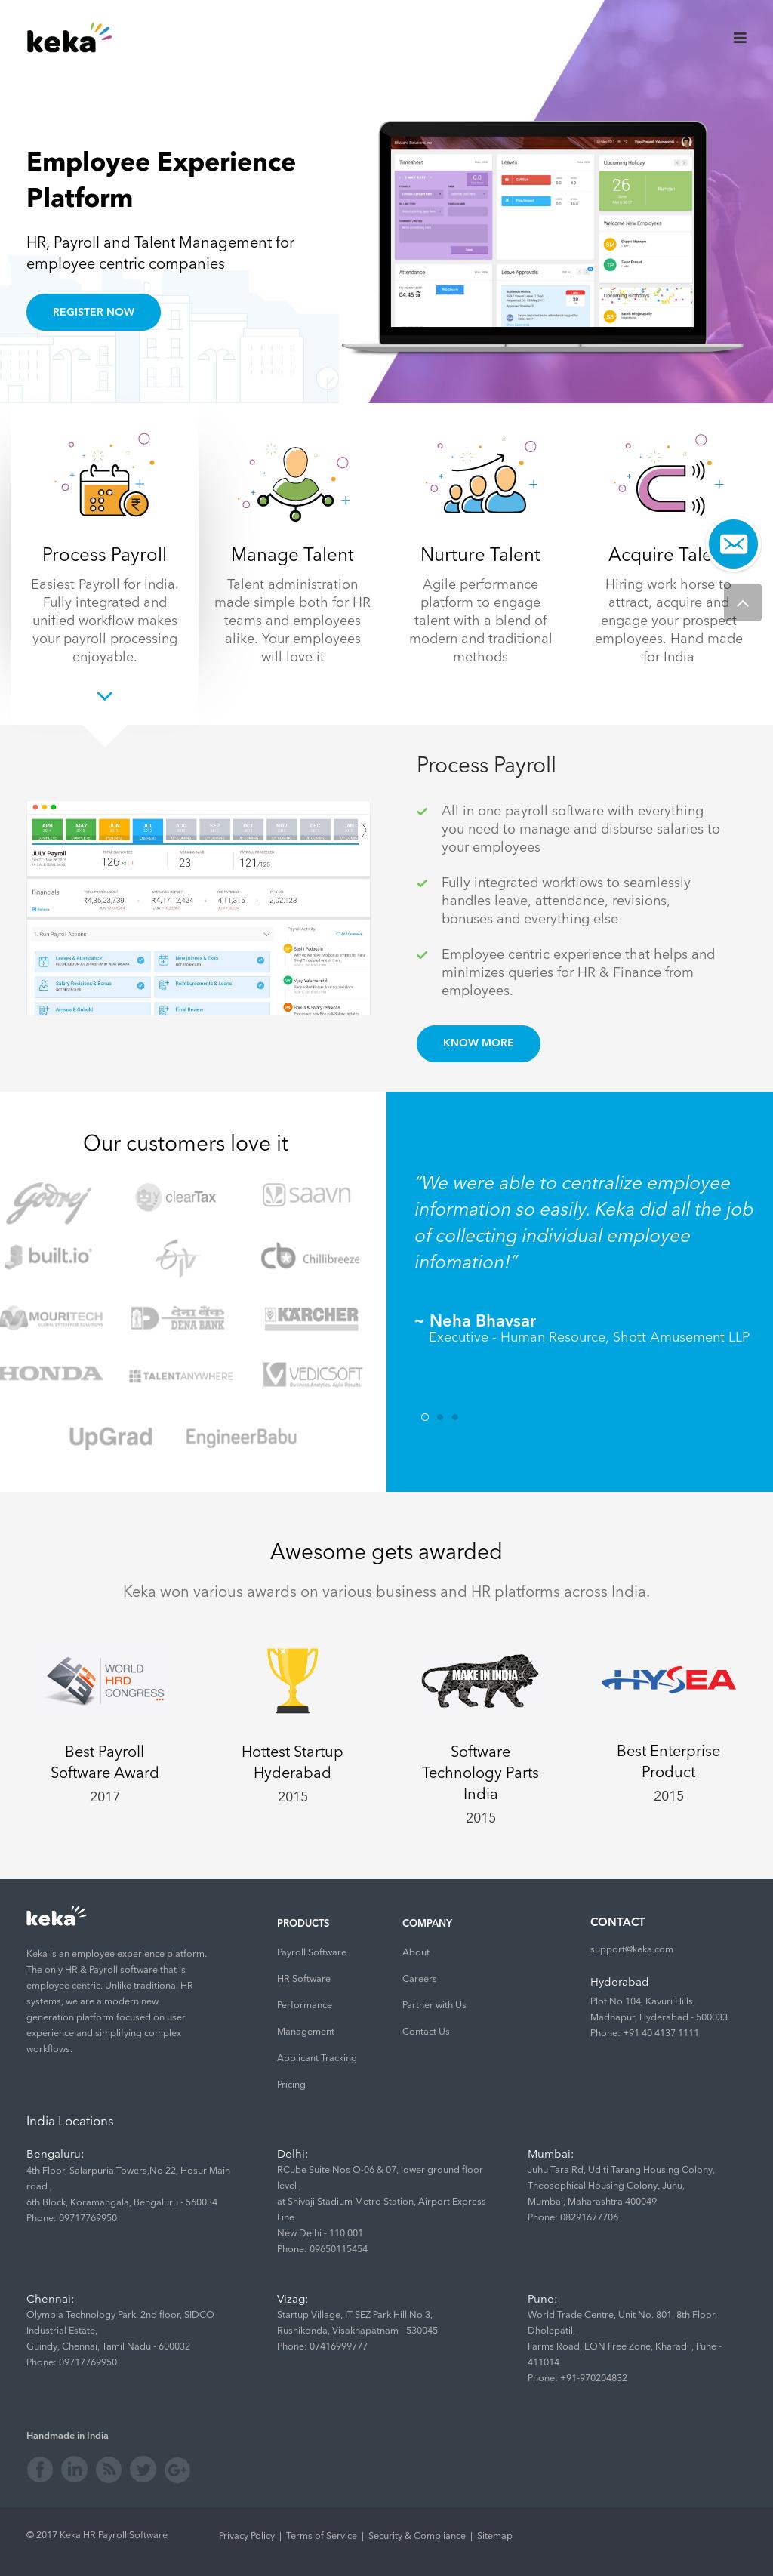 Keka Competitors, Revenue and Employees - Owler Company Profile